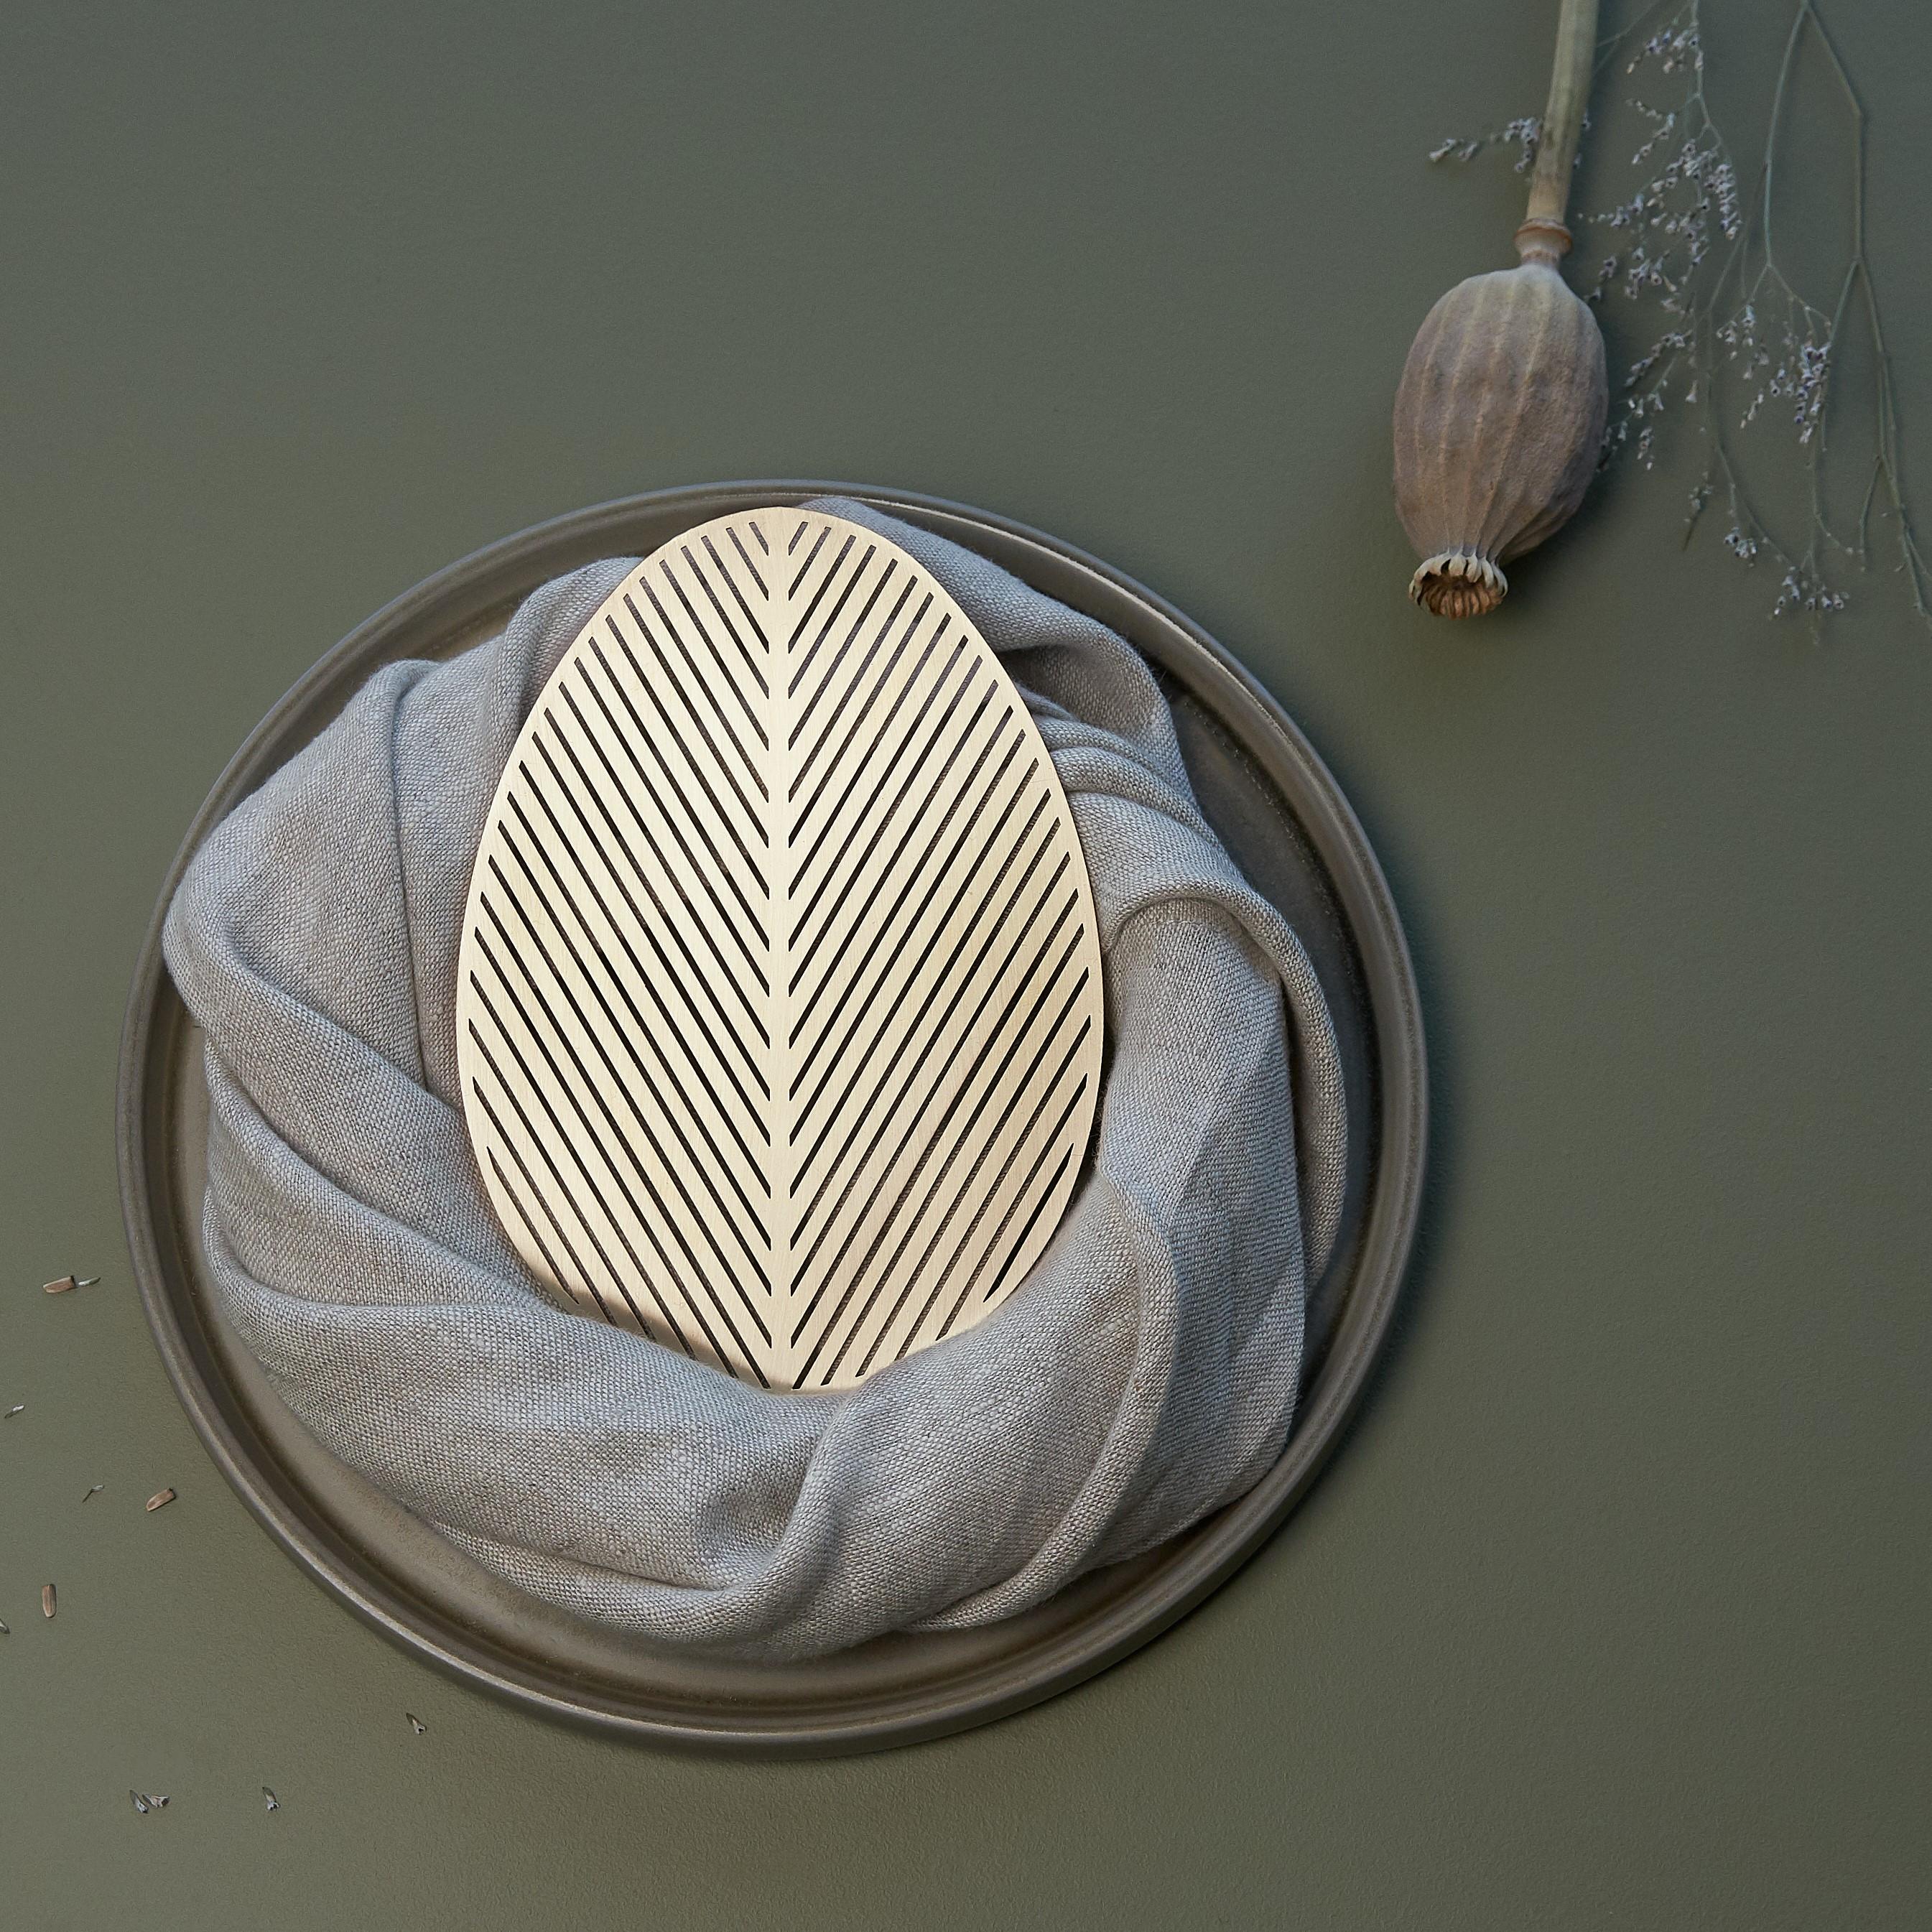 1_Brass-coaster-PALME-table-decor-Namuos